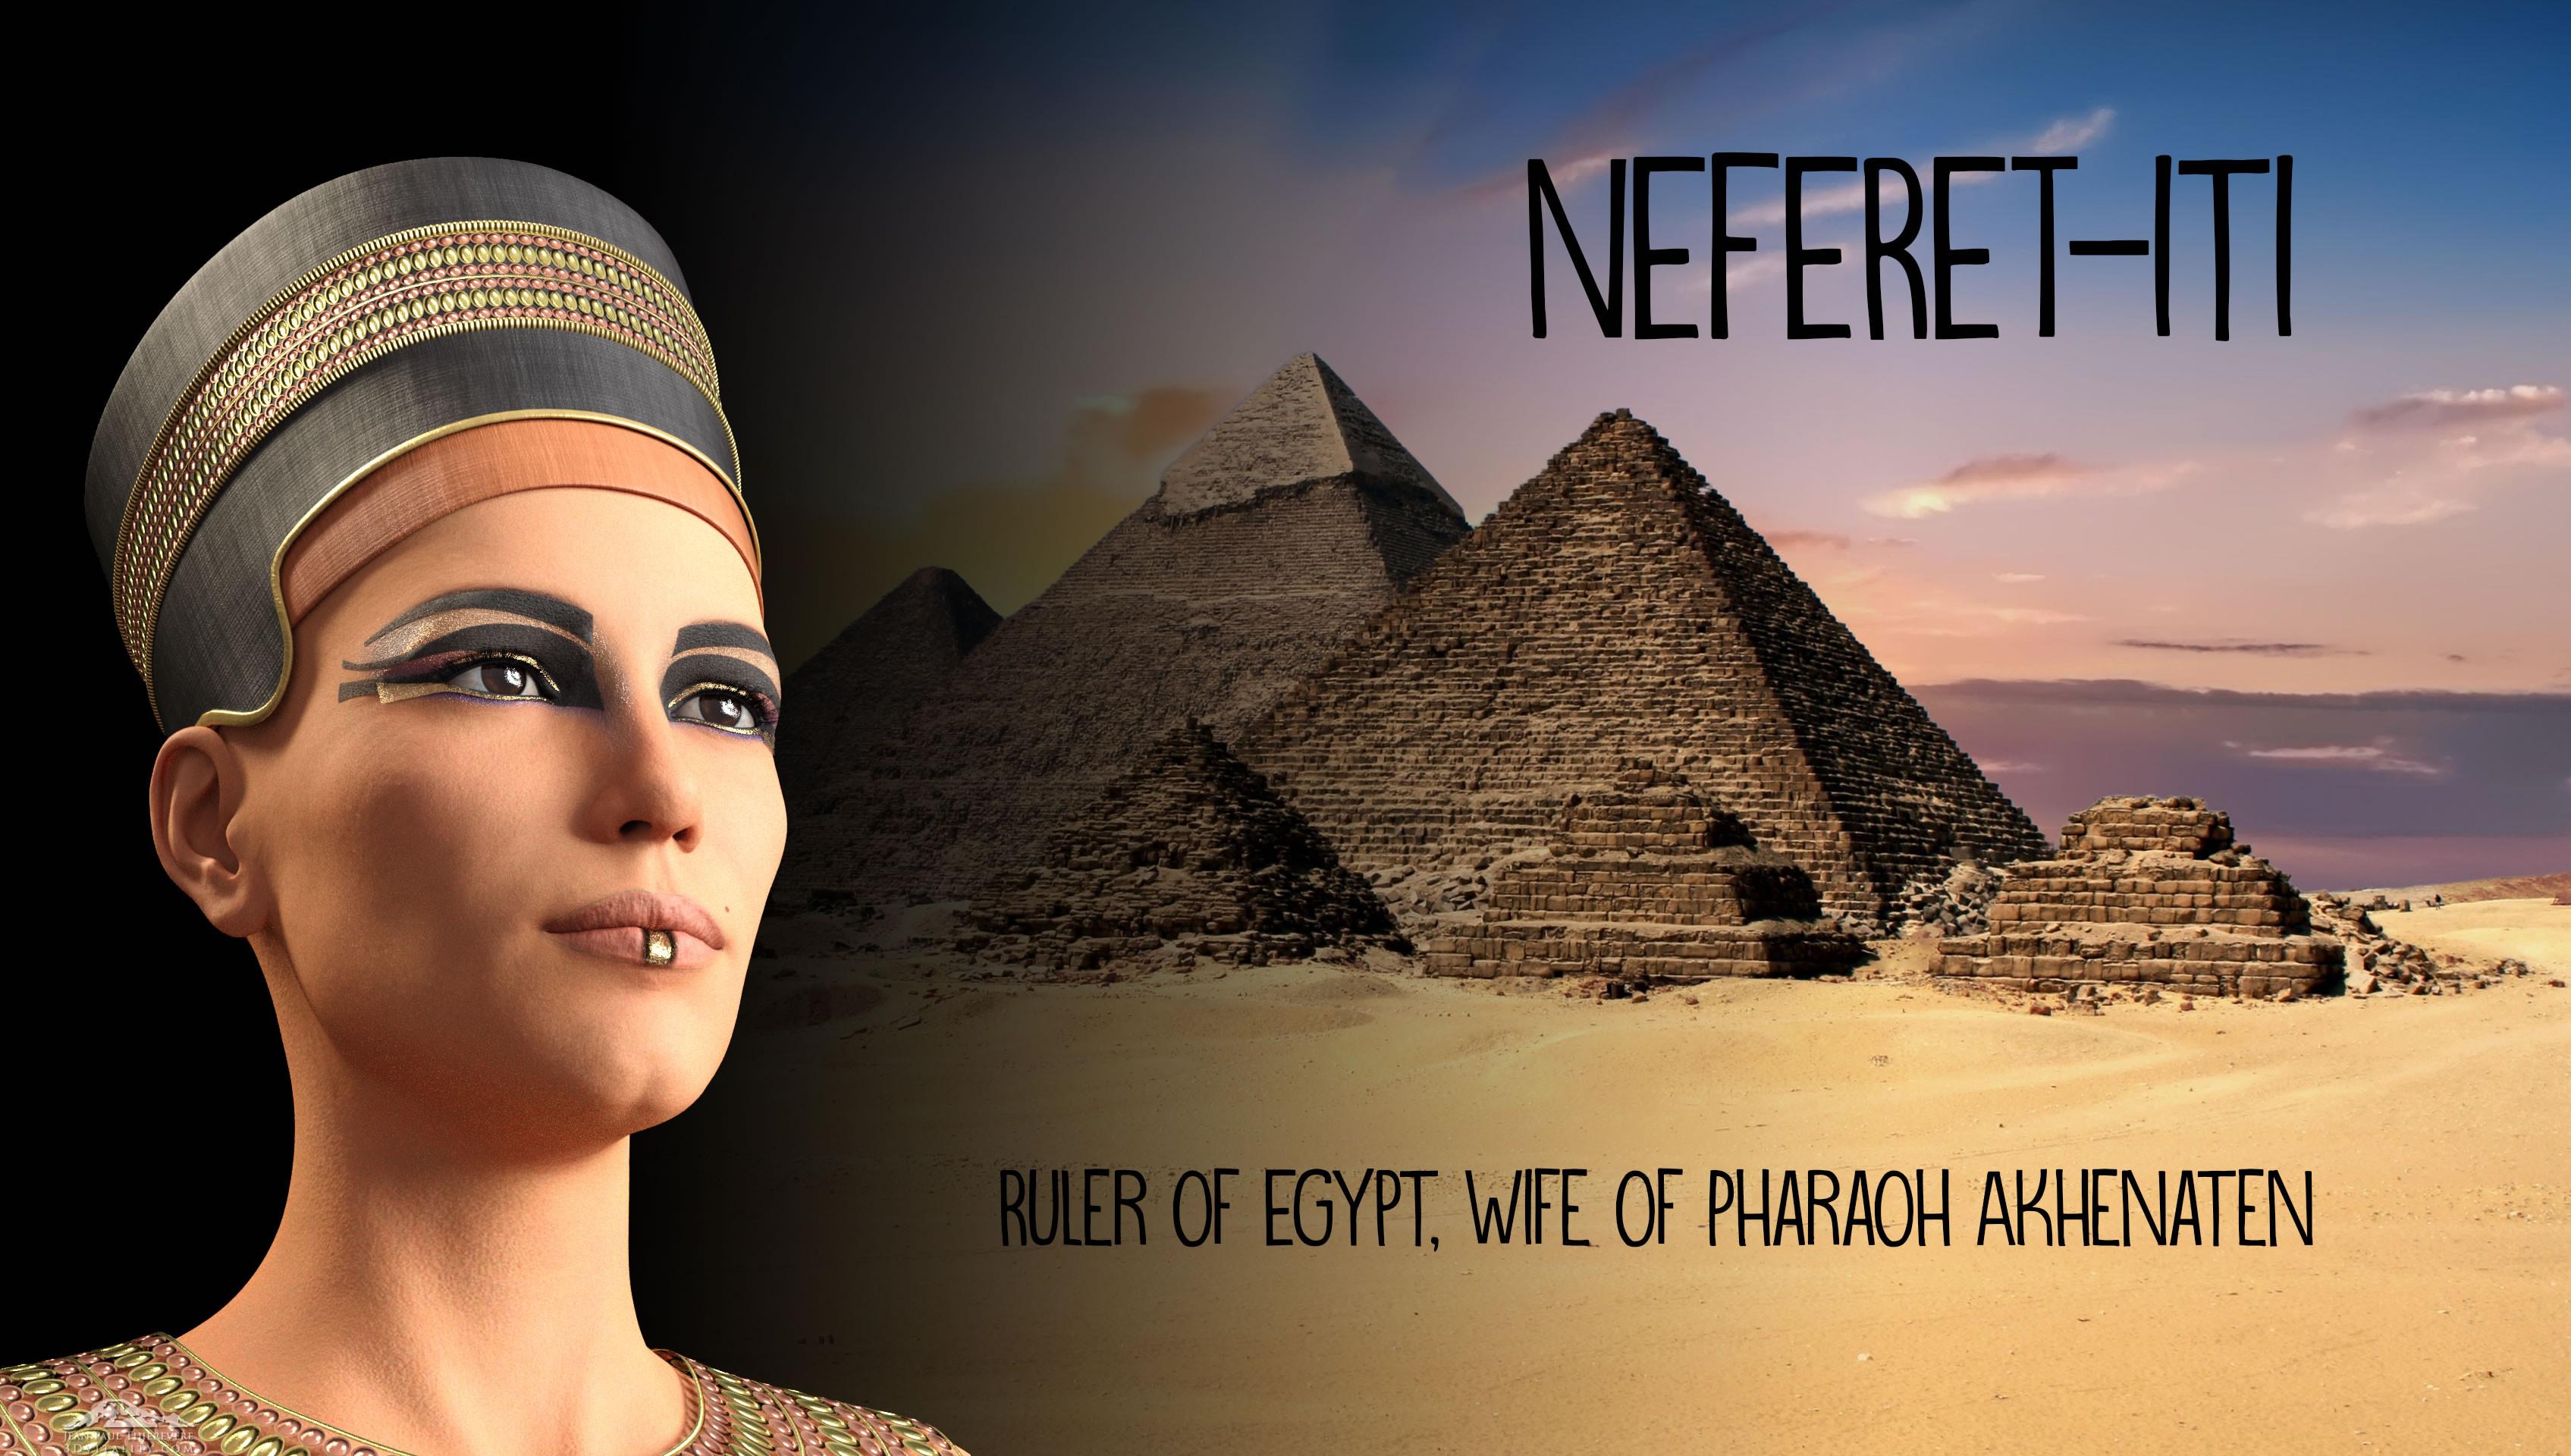 Neferet-iti, poster 1 background photo by  Pete Linforth